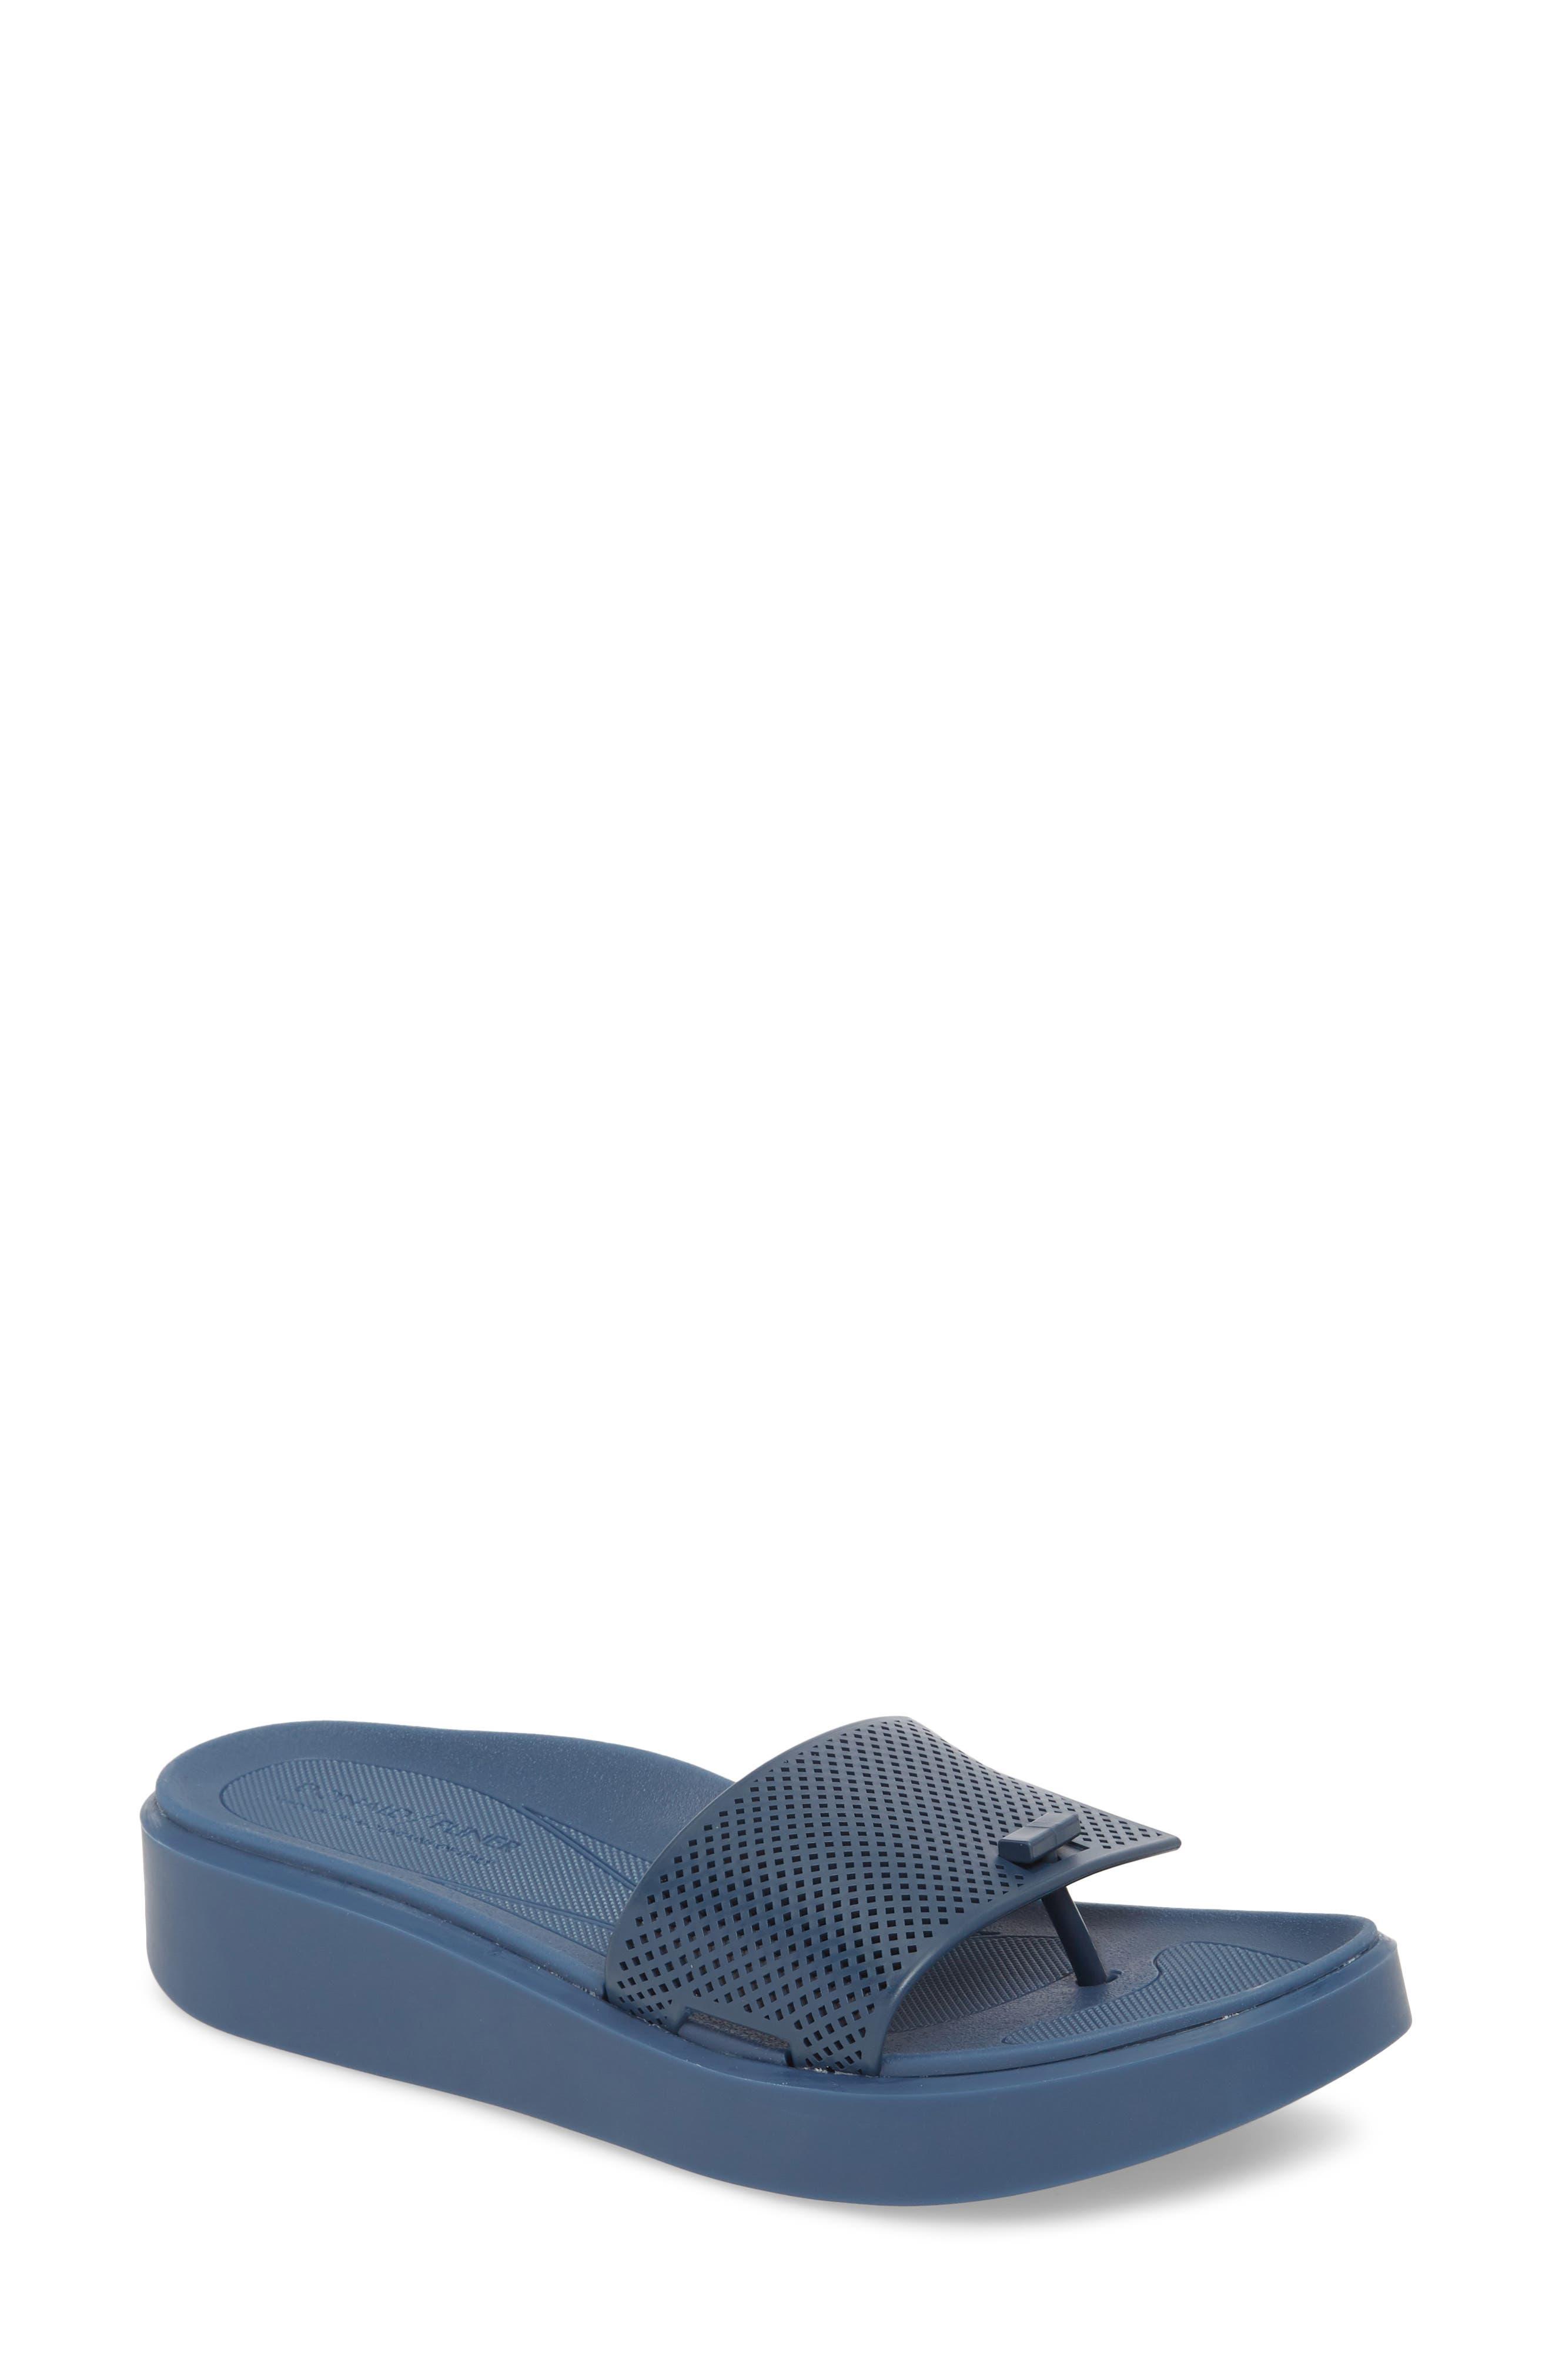 Bondi Jelly Slide Sandal,                             Main thumbnail 1, color,                             Navy